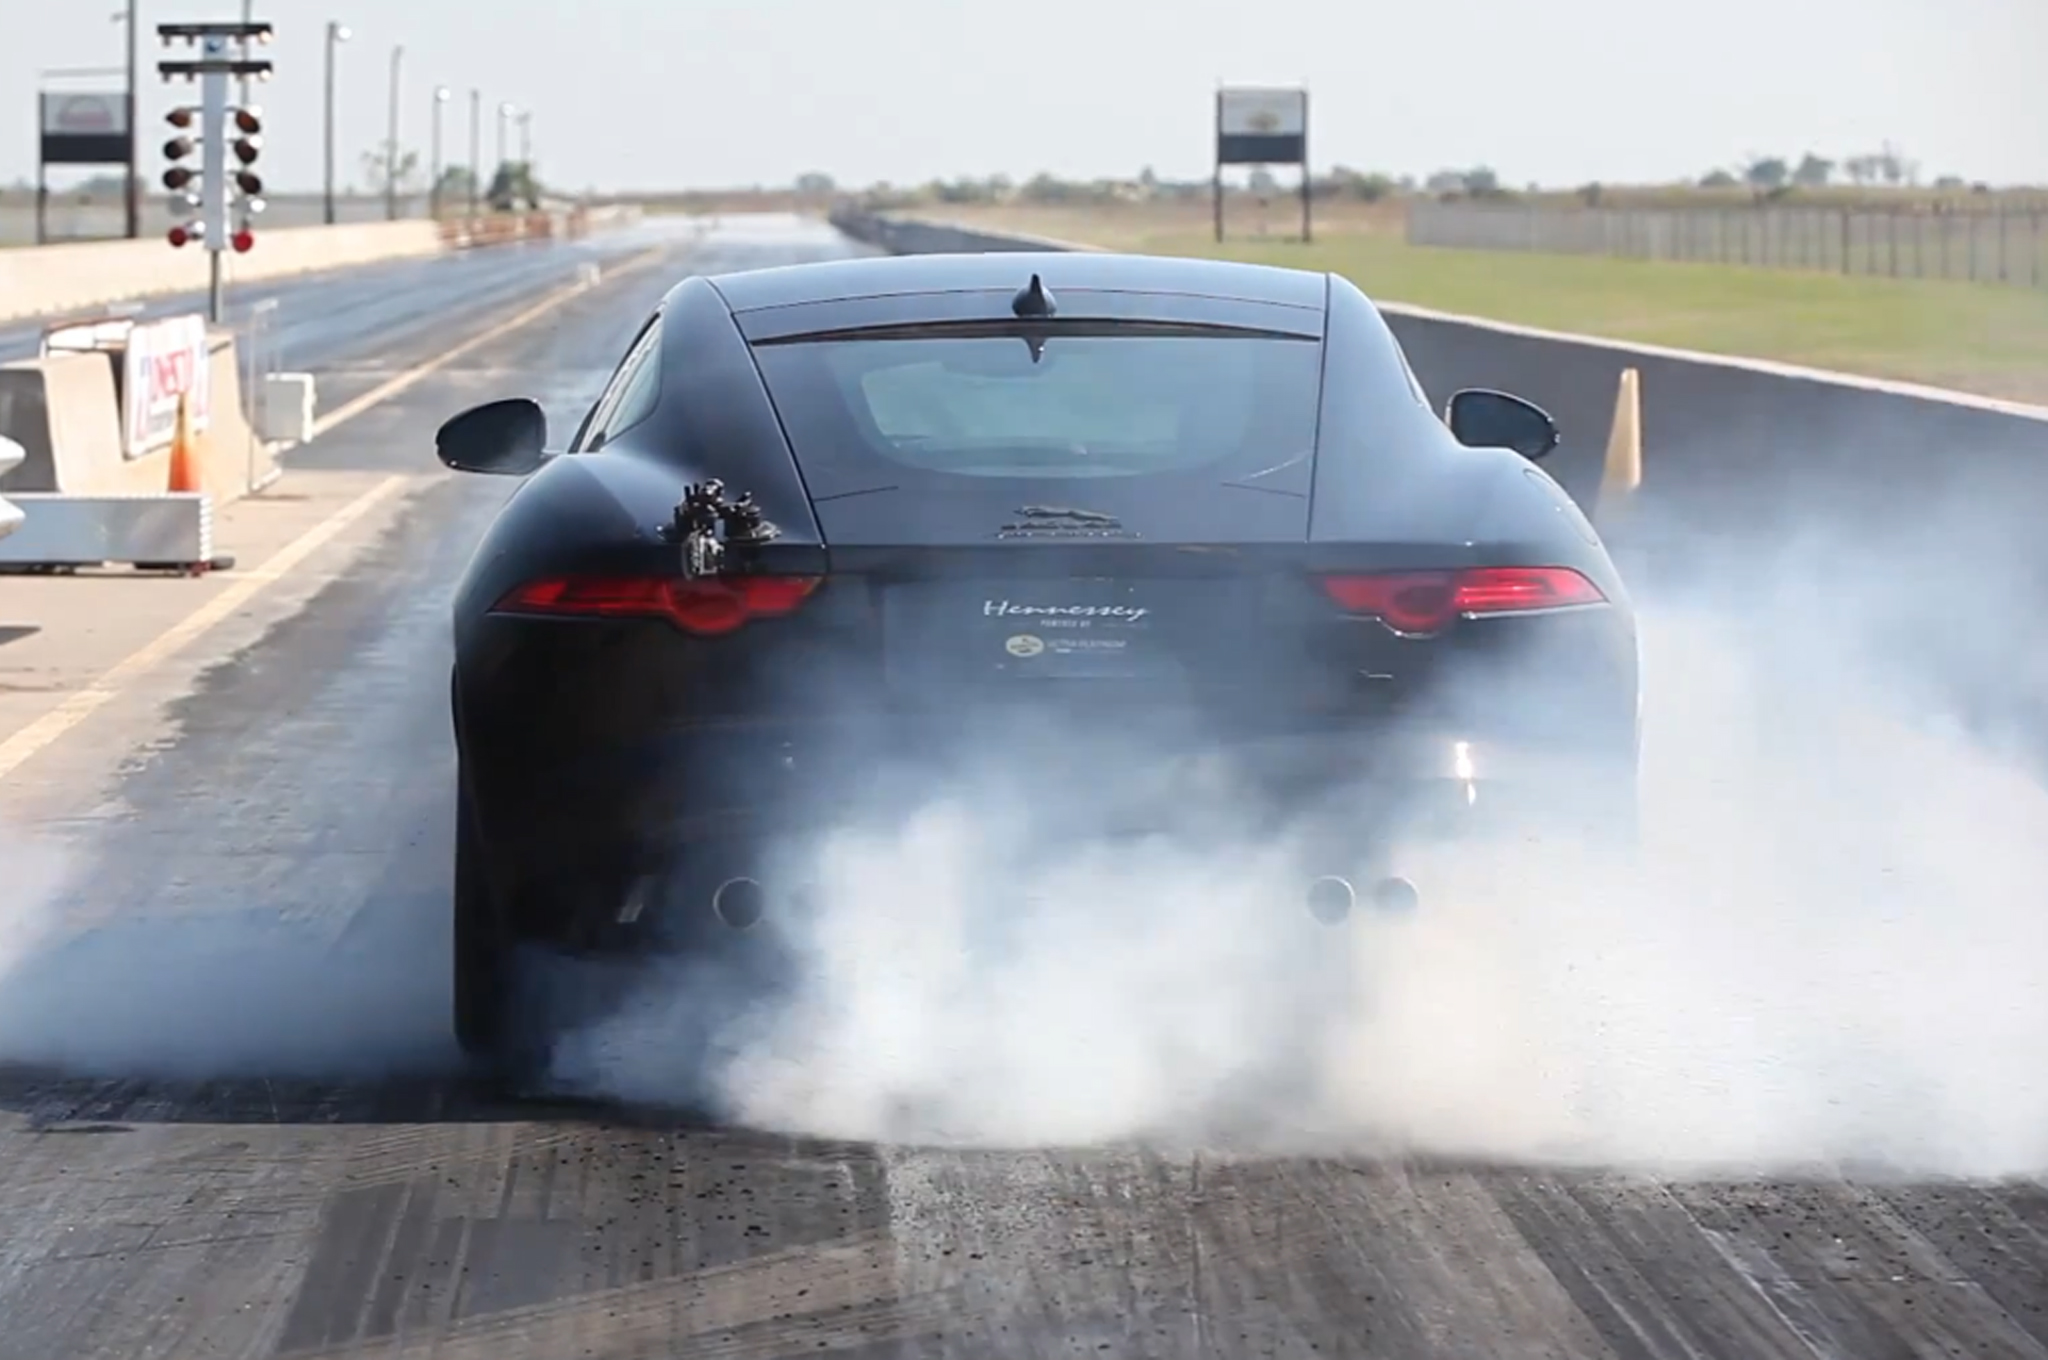 623hp hennessey hpe600 jaguar f type r released w video super street